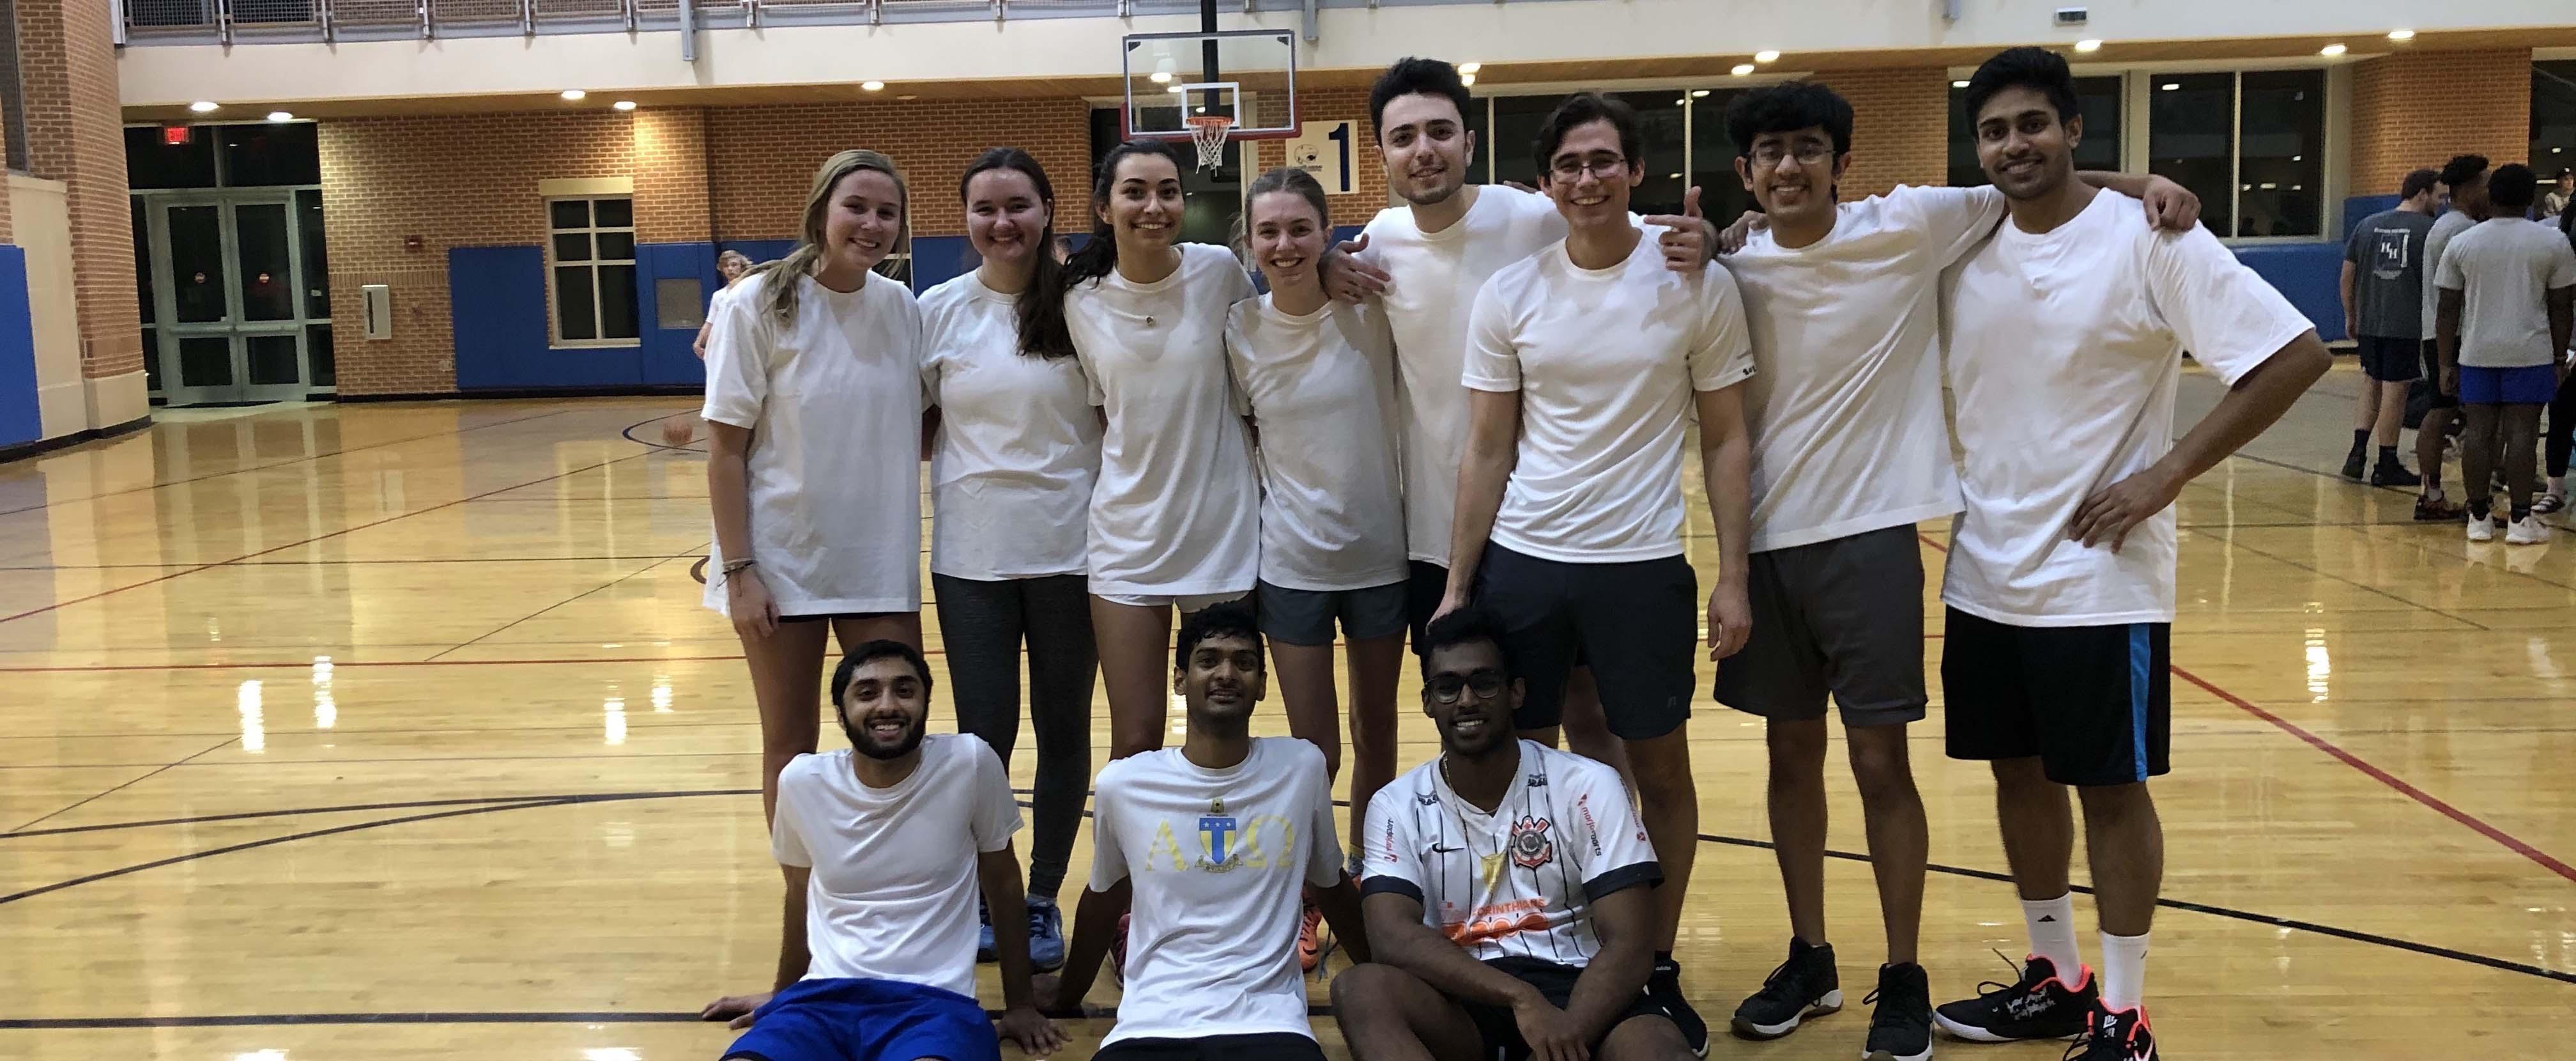 AED 2019-2020 intramural basketball team